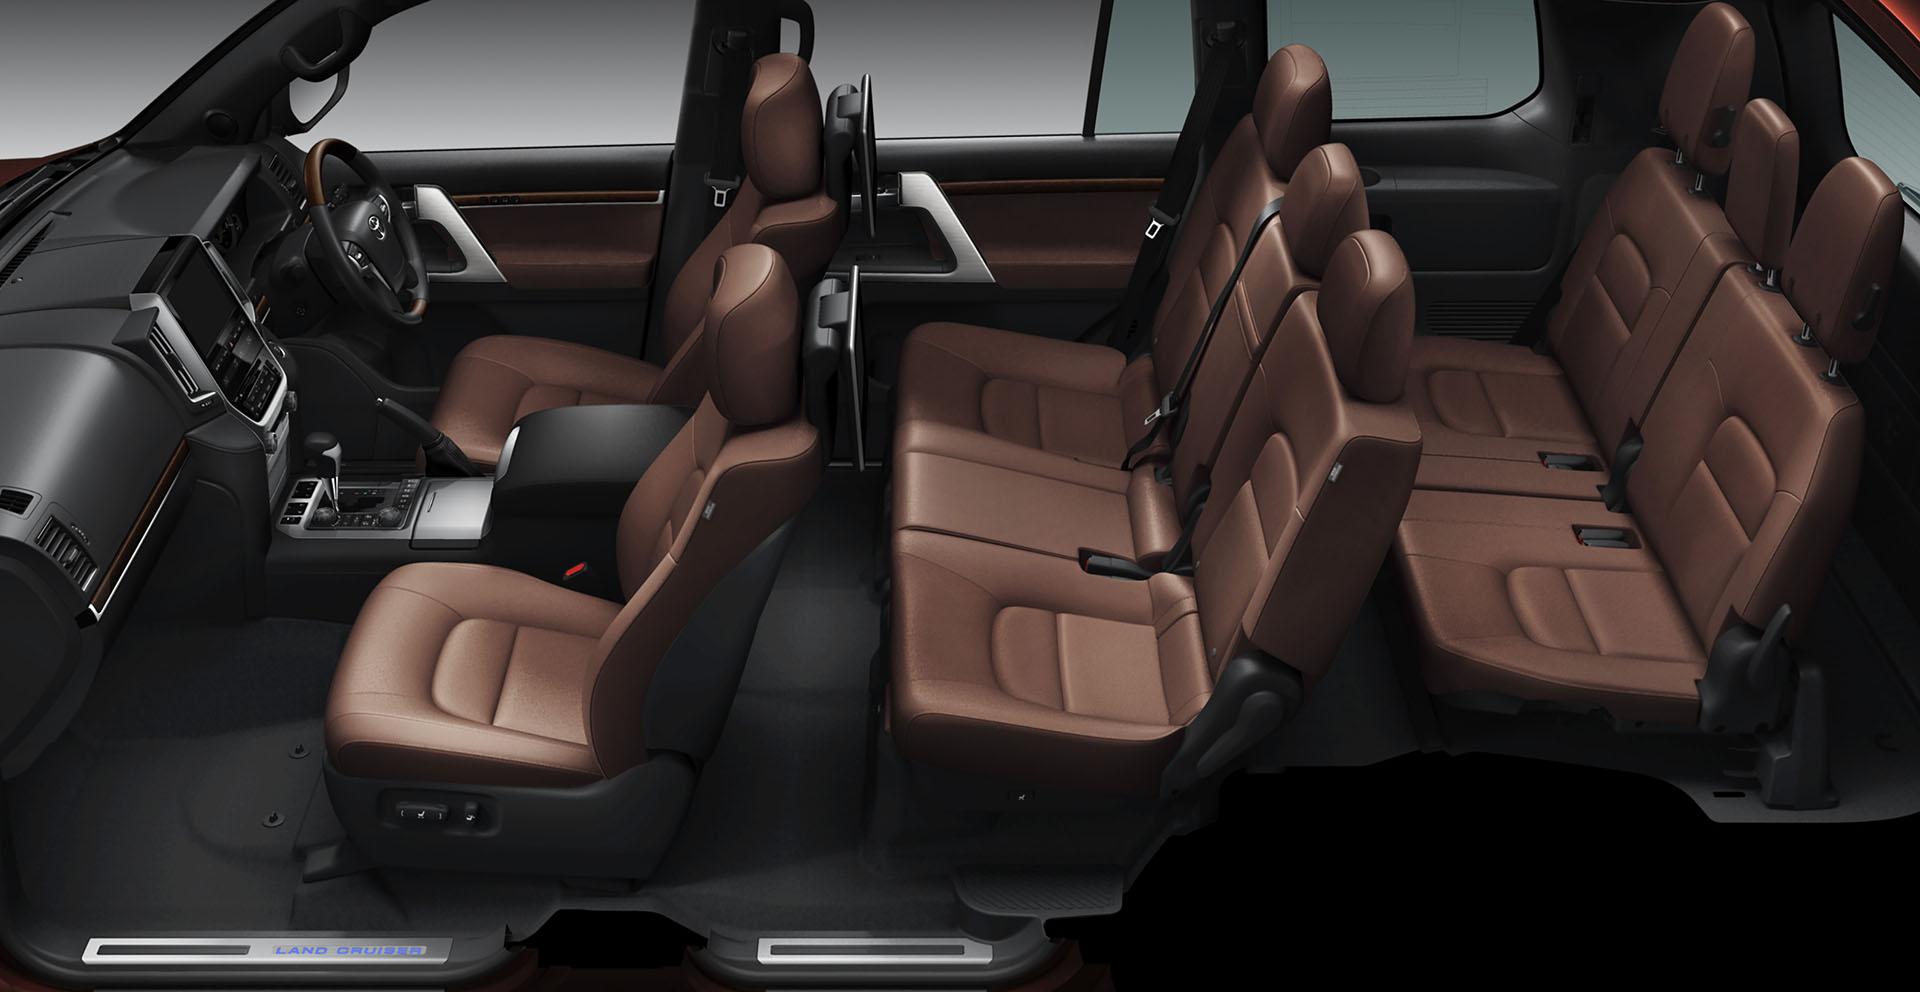 Toyota Land Cruiser 2016 interior - 7 seats